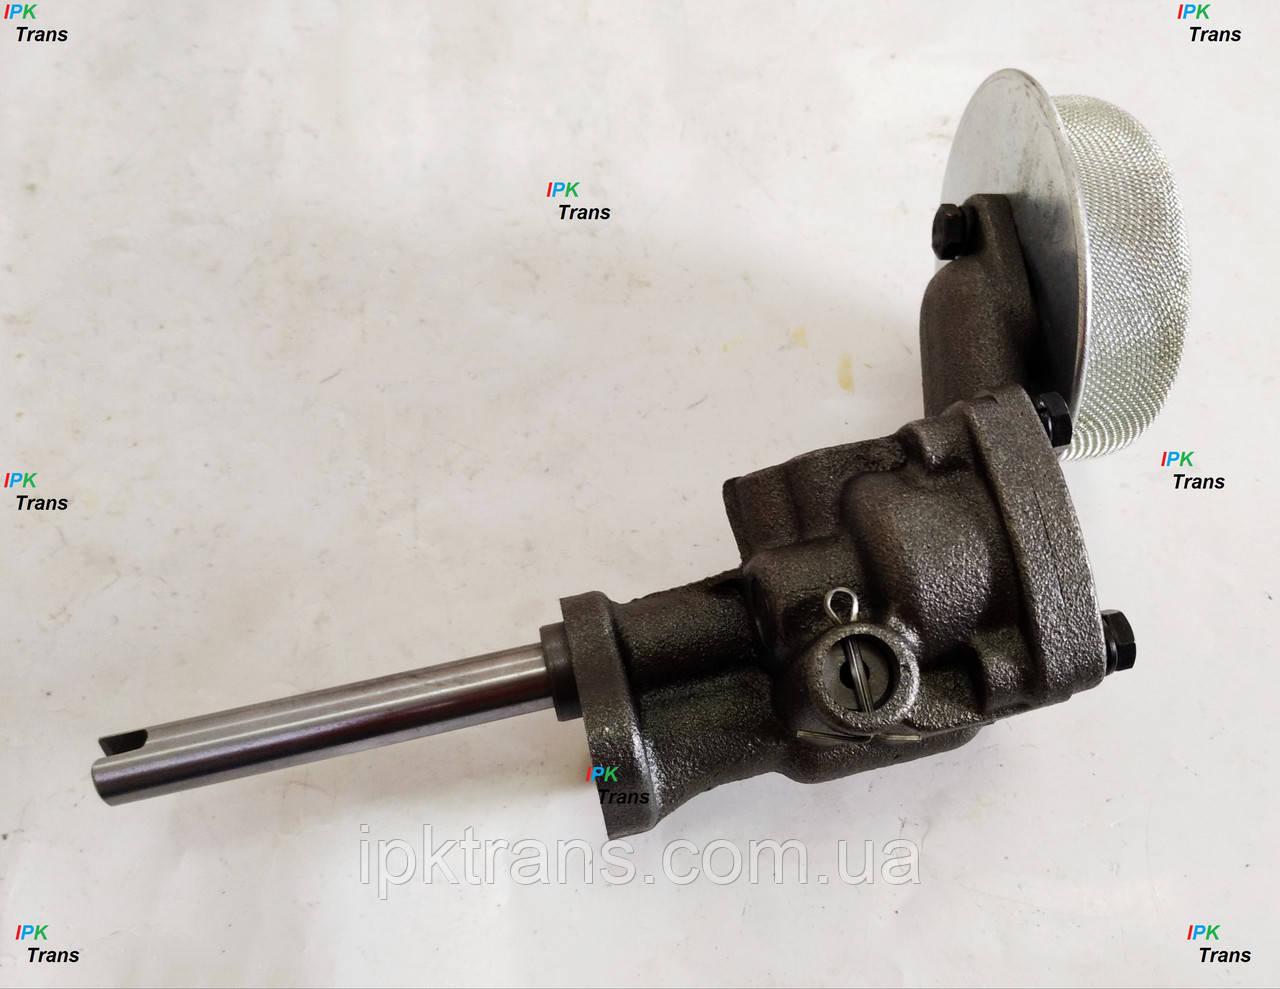 Насос масляный  на двигатель NISSAN H20 (1440 грн) KOVO 15010-66202 / 1501066202